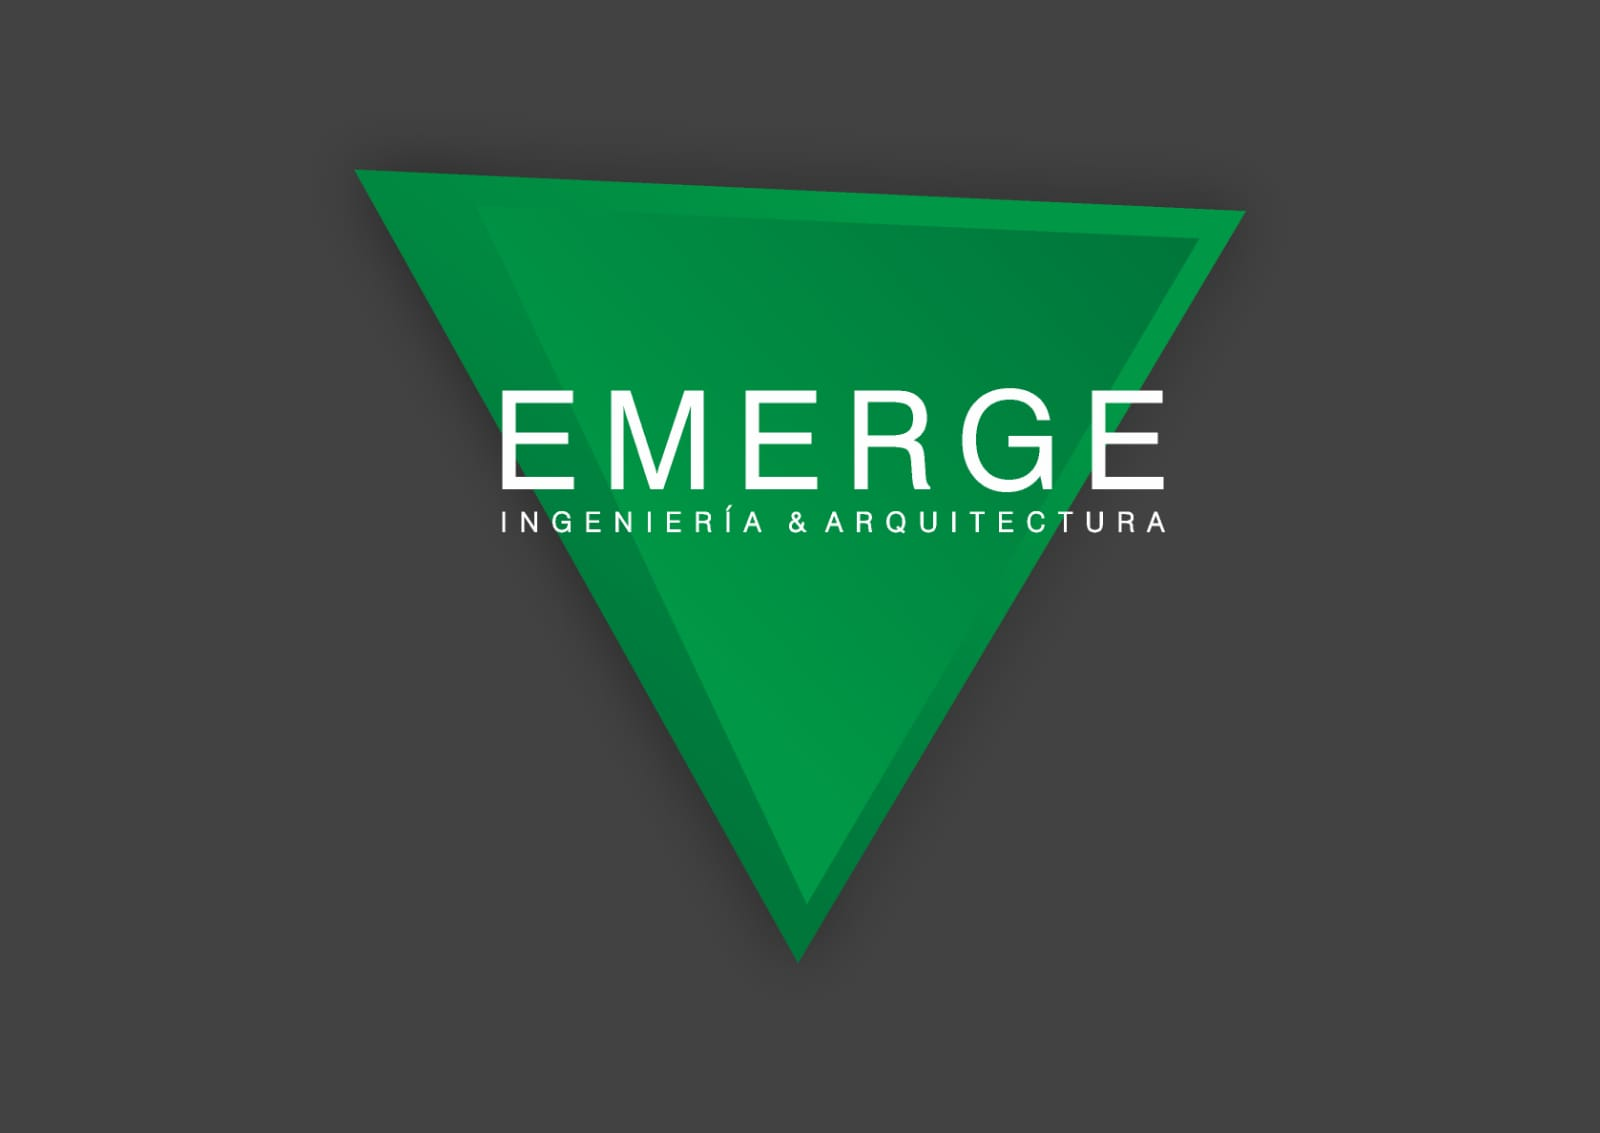 Emerge Ingeniería